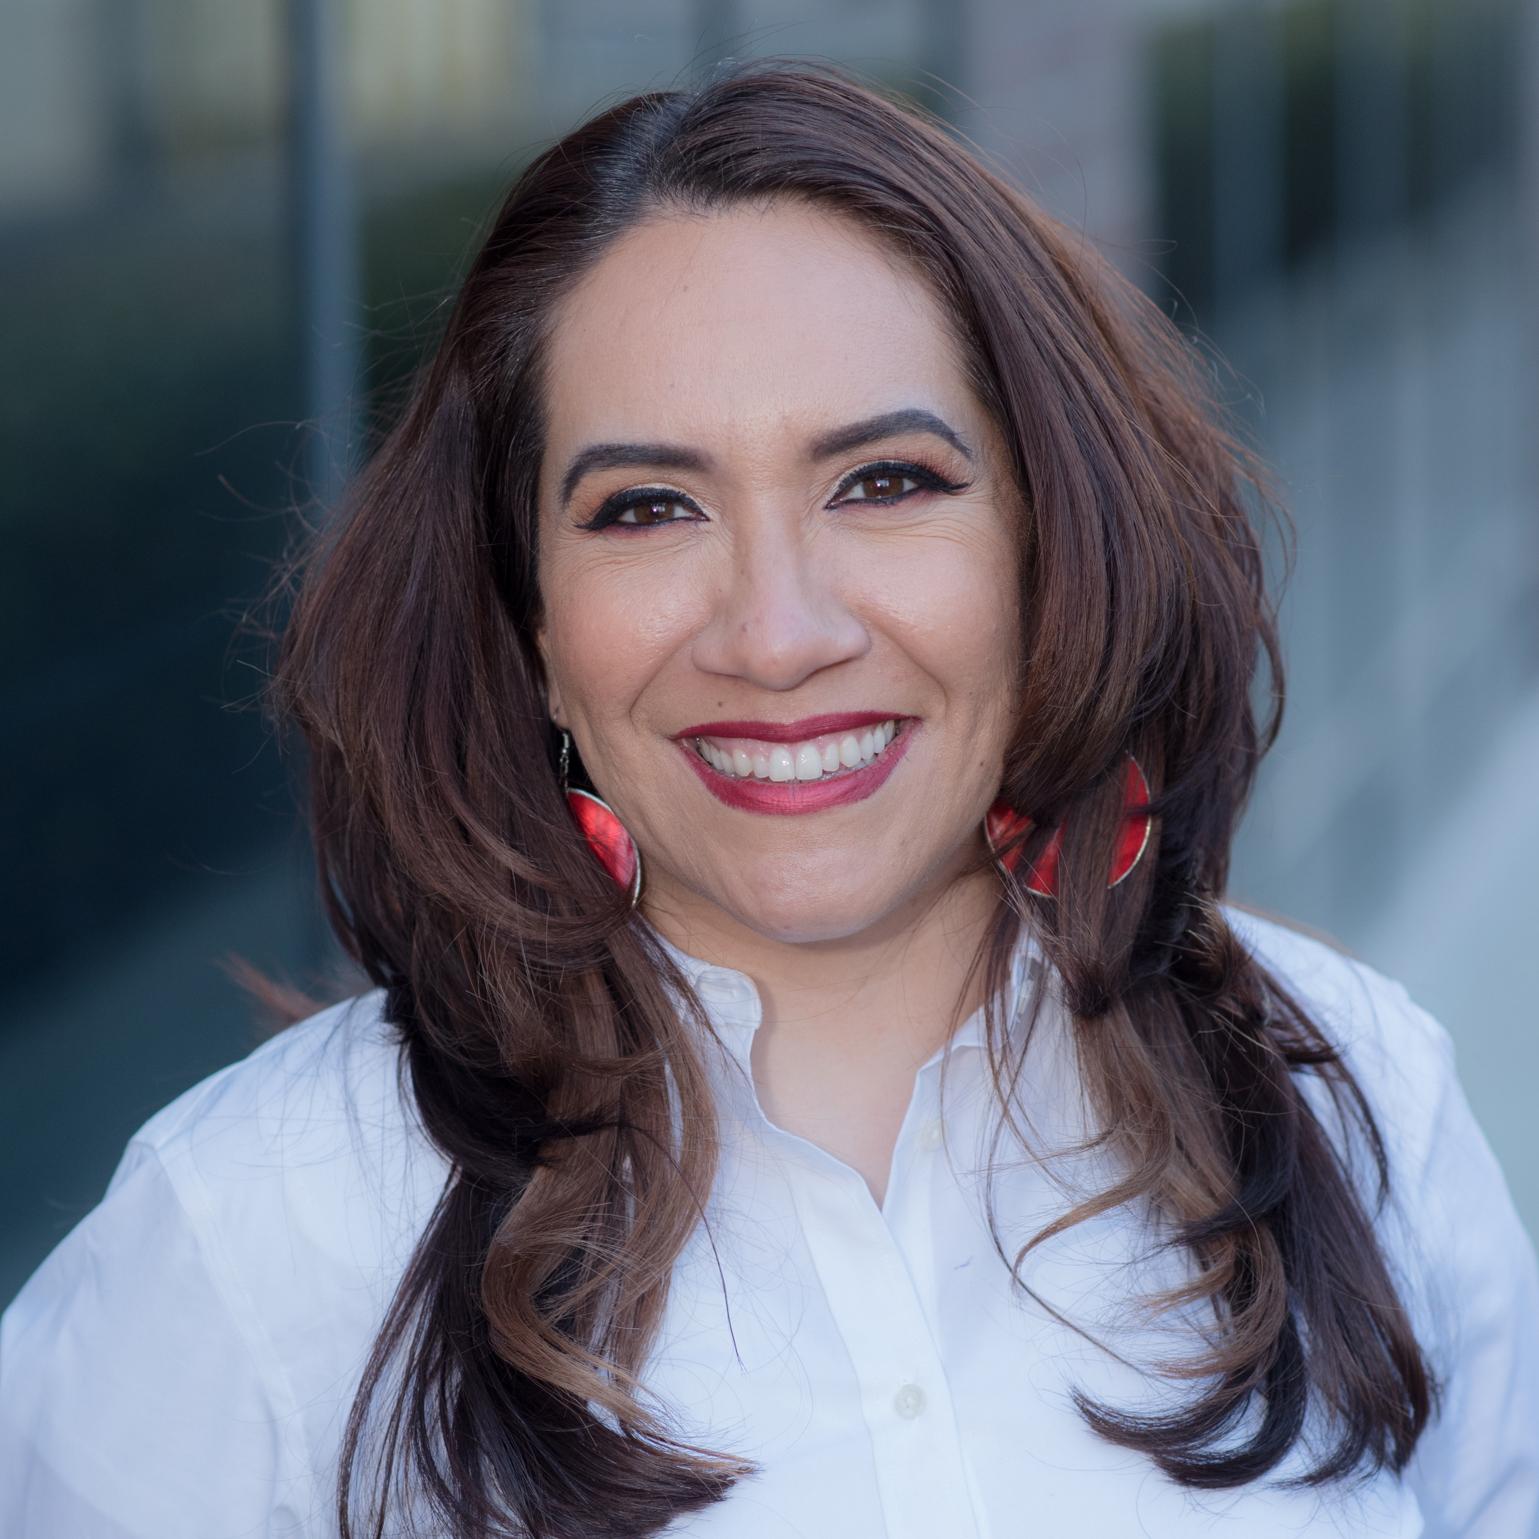 Marcela Ramirez-Stapleton